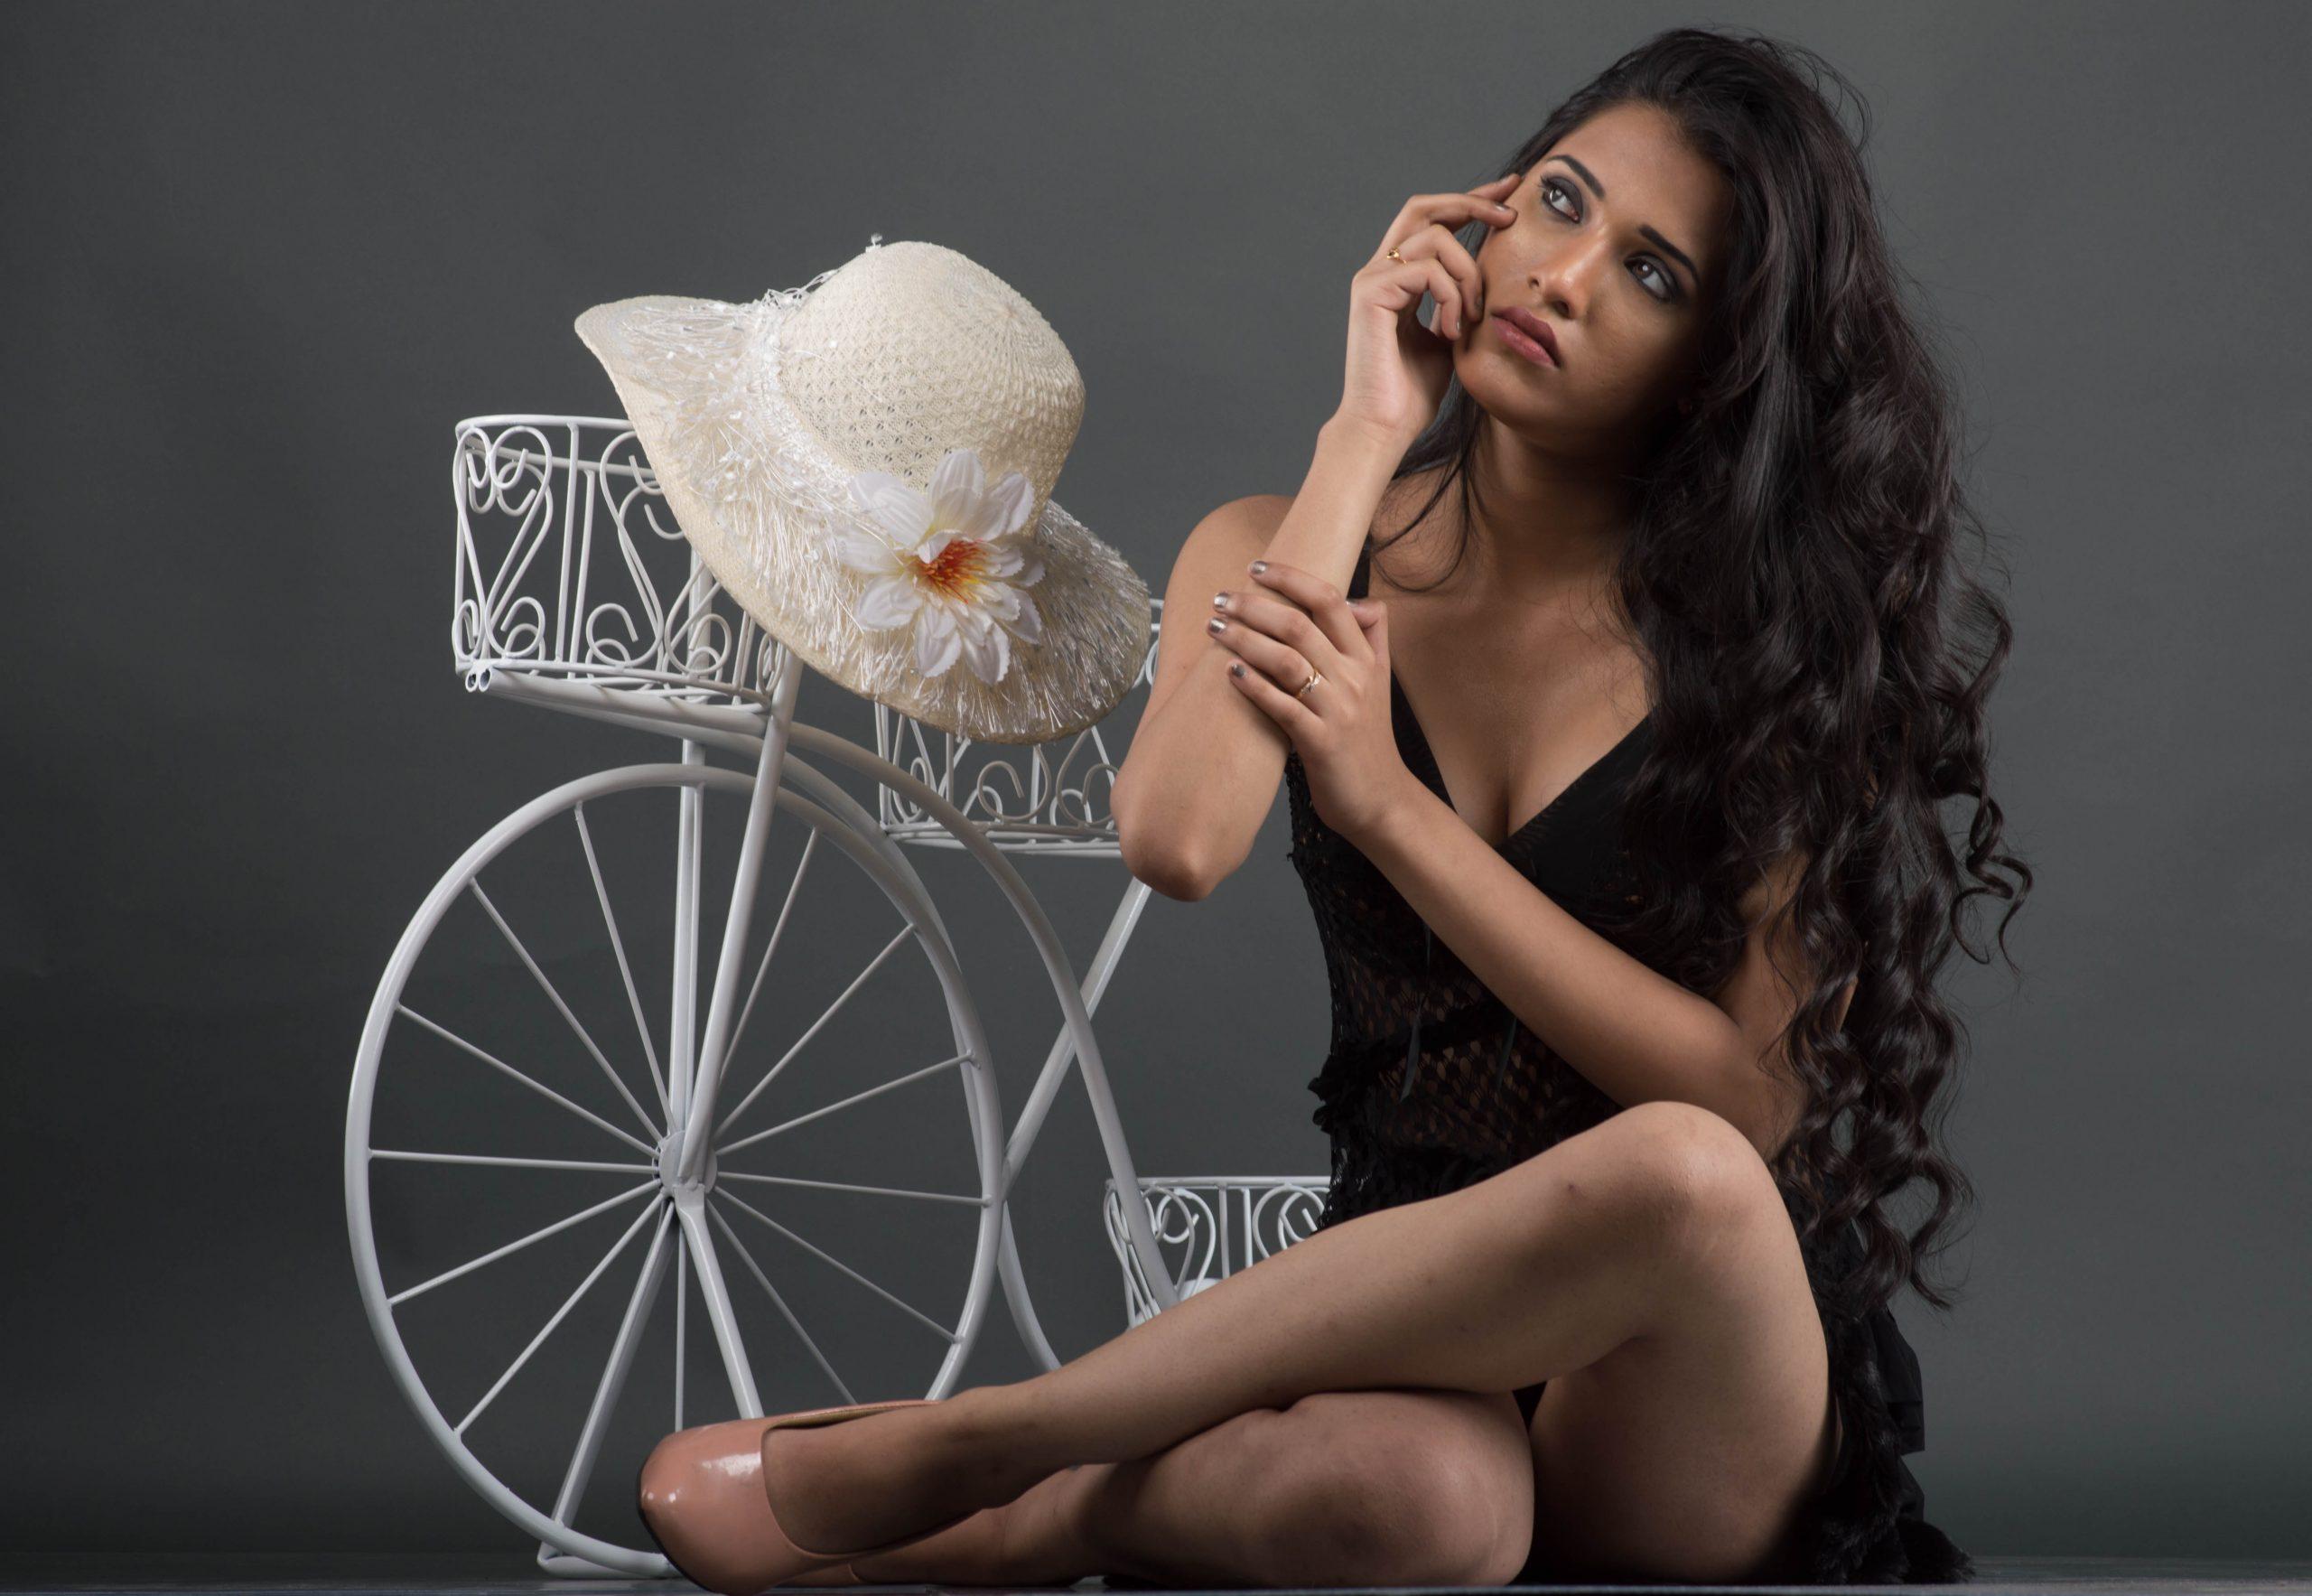 Female model posing near the cycle